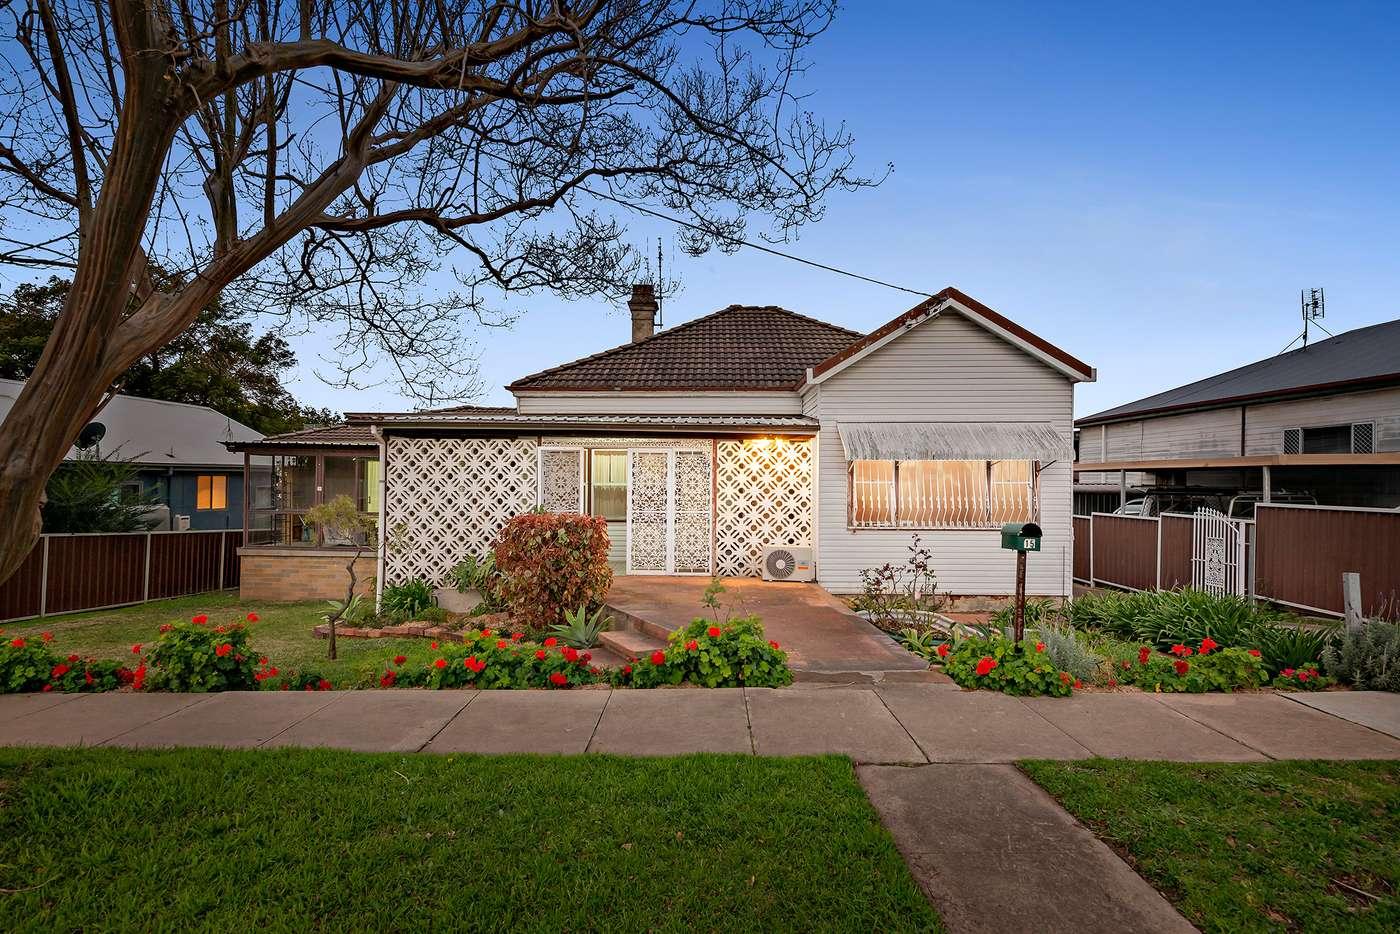 Main view of Homely house listing, 15 Bridge Street, Waratah NSW 2298